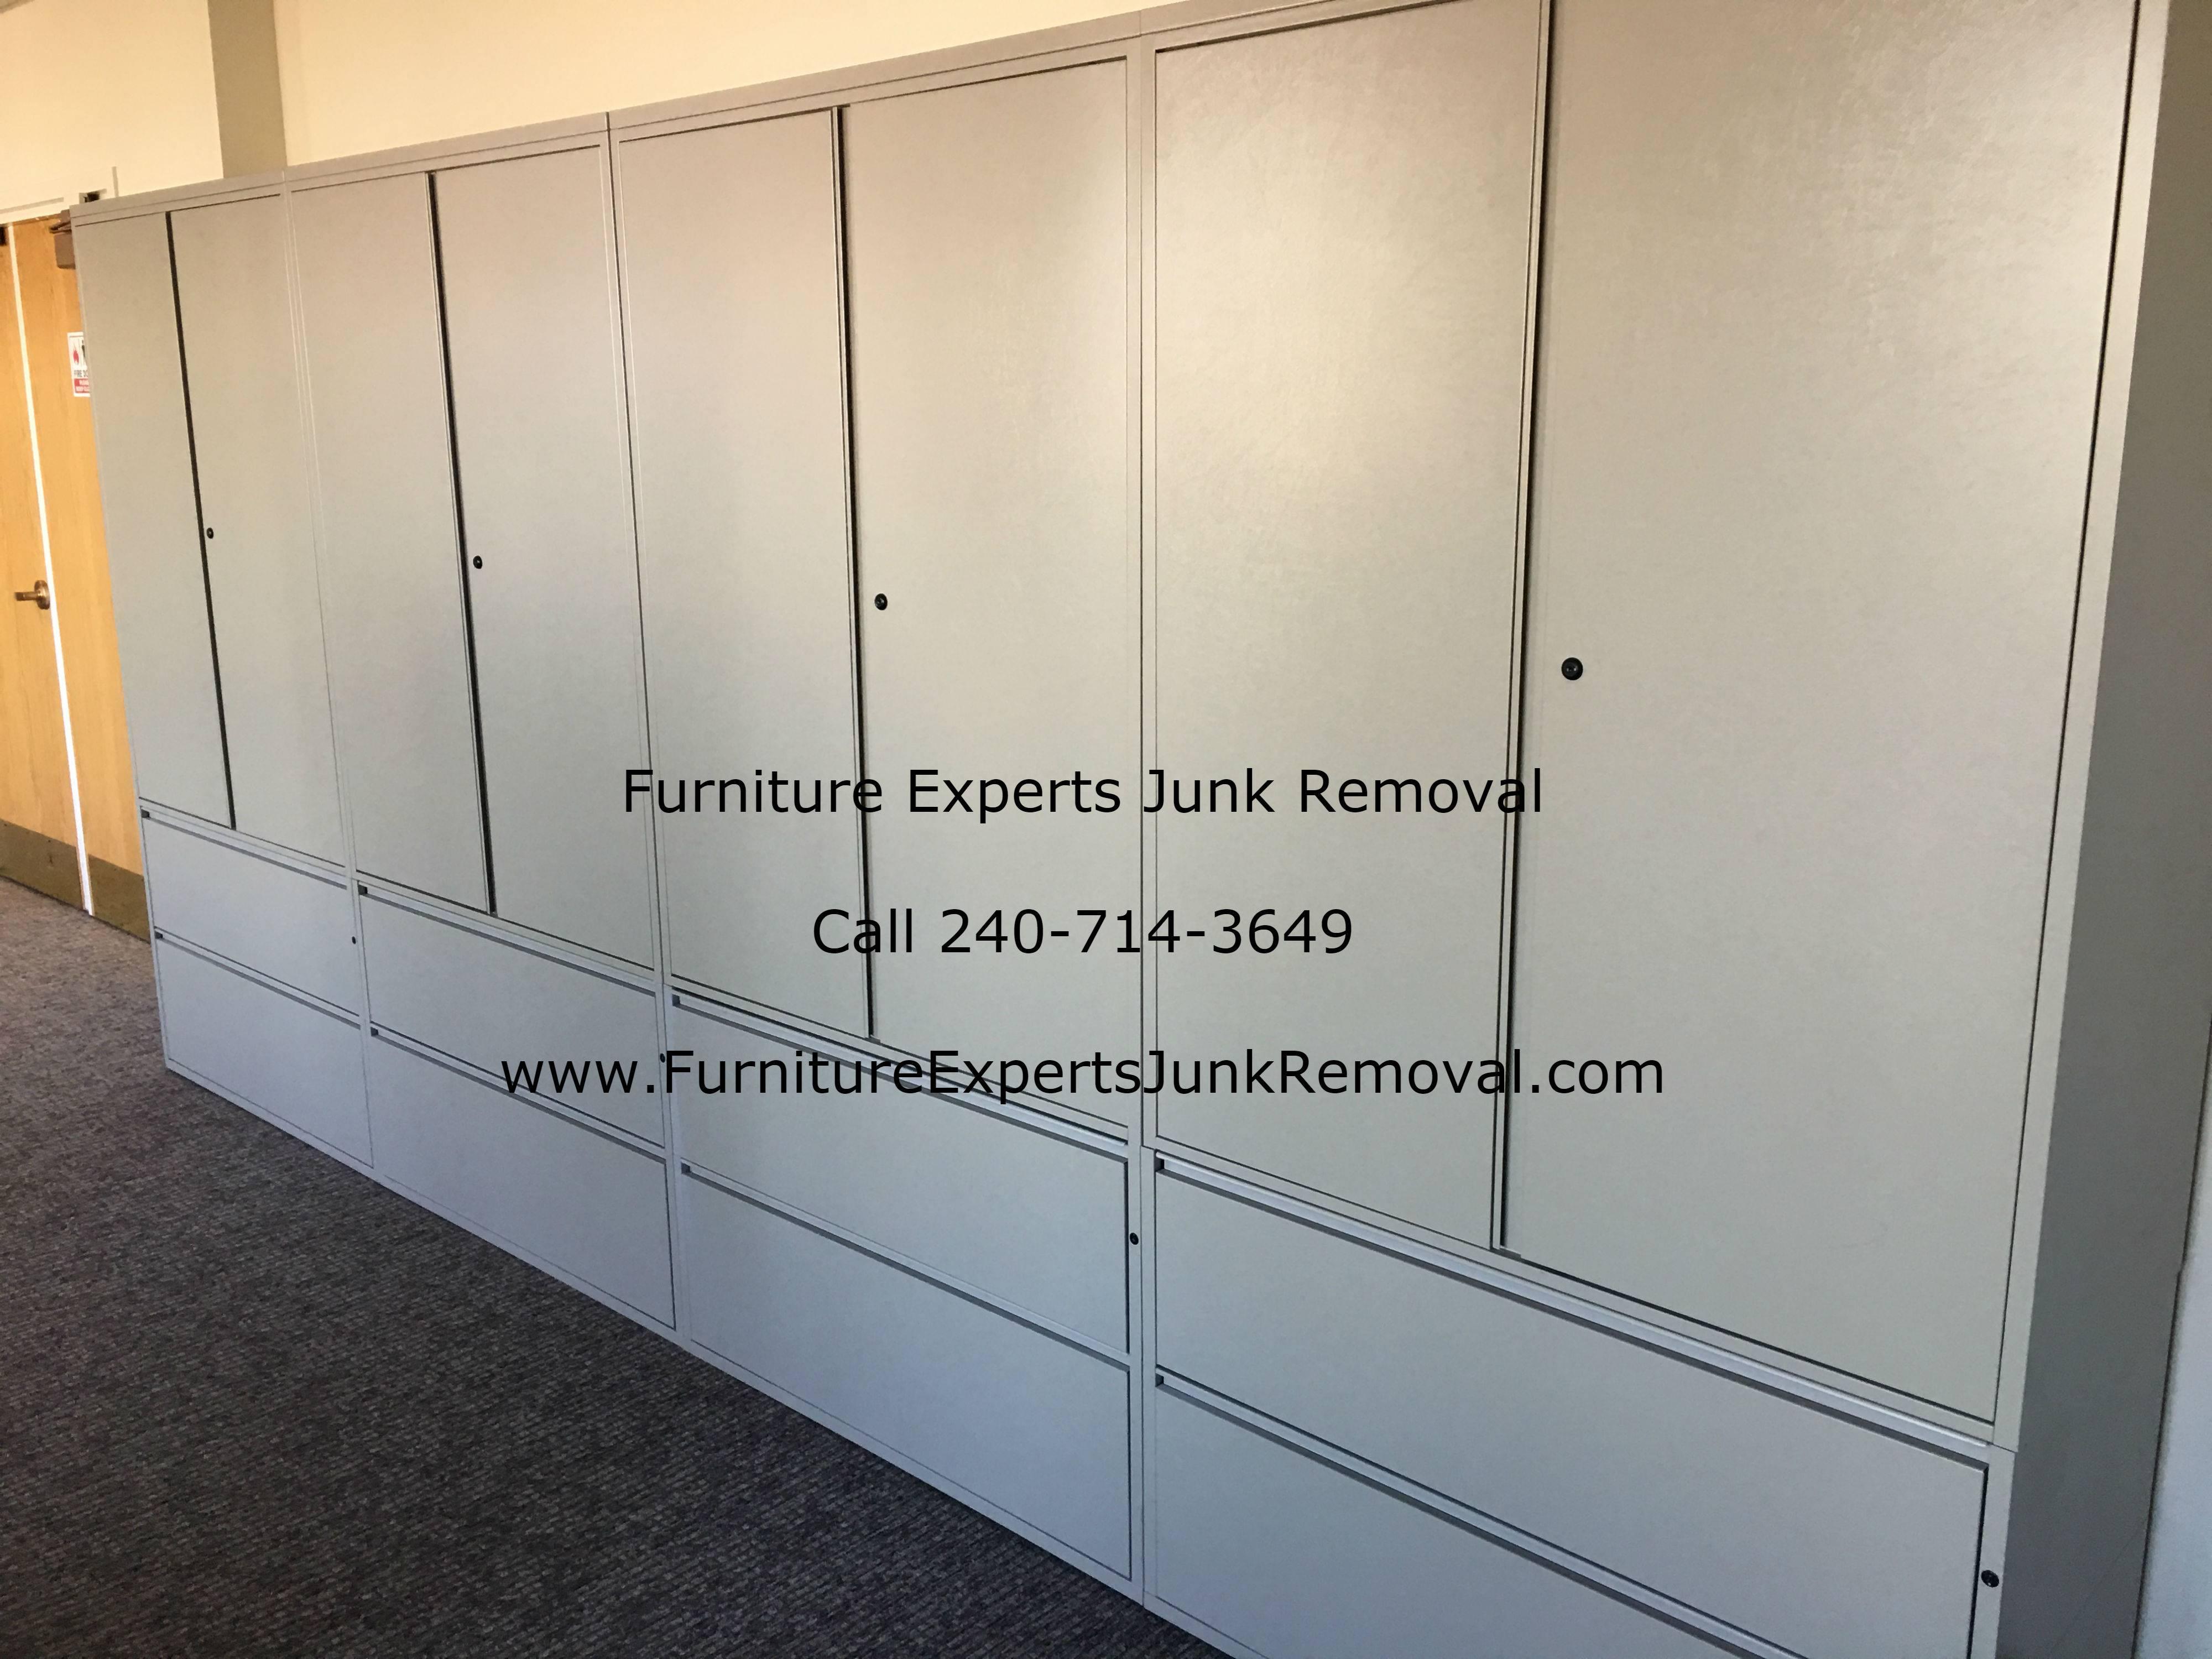 Junk office furniture removal in Ashburn VA